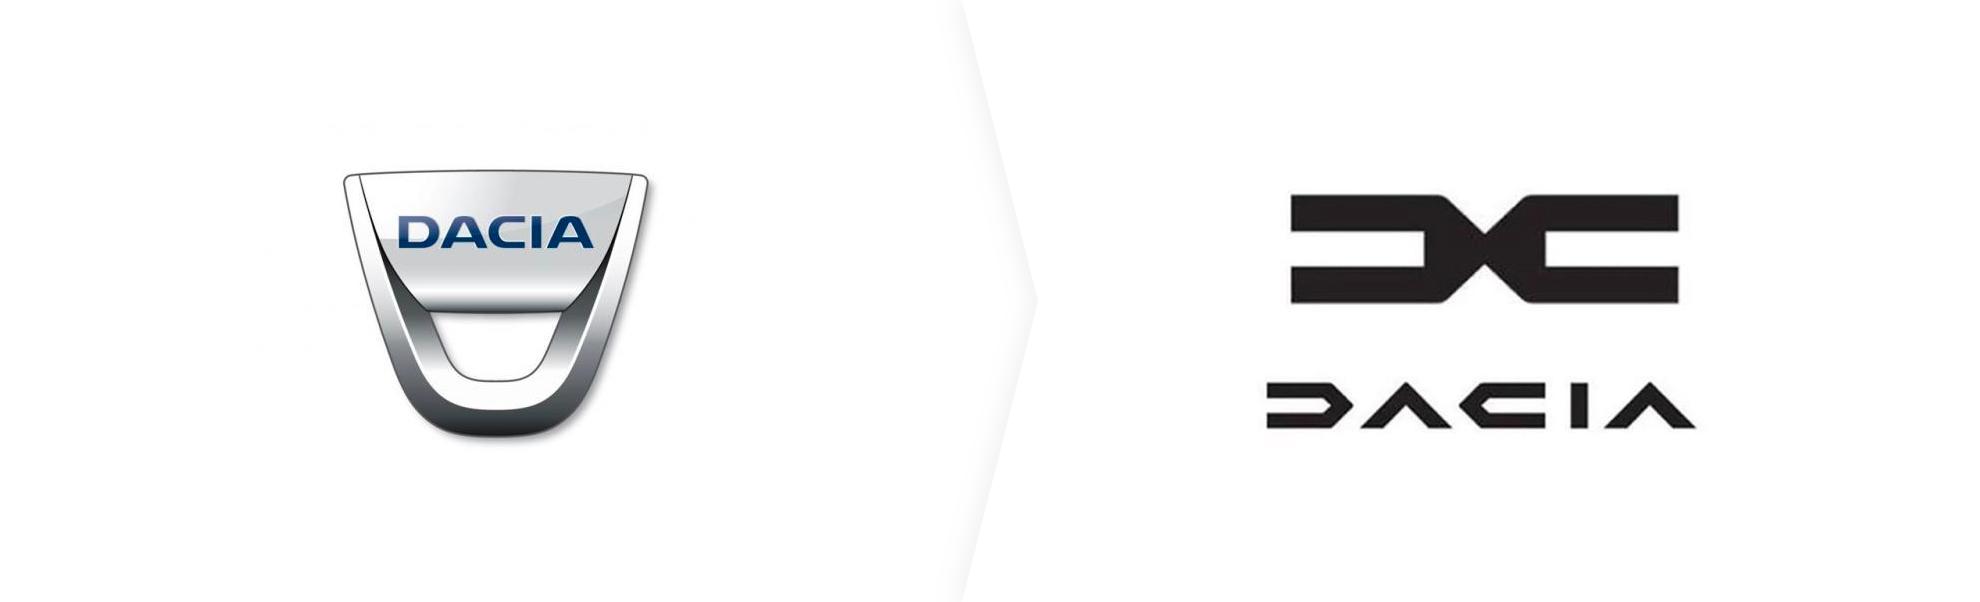 dacia stare i nowe logo